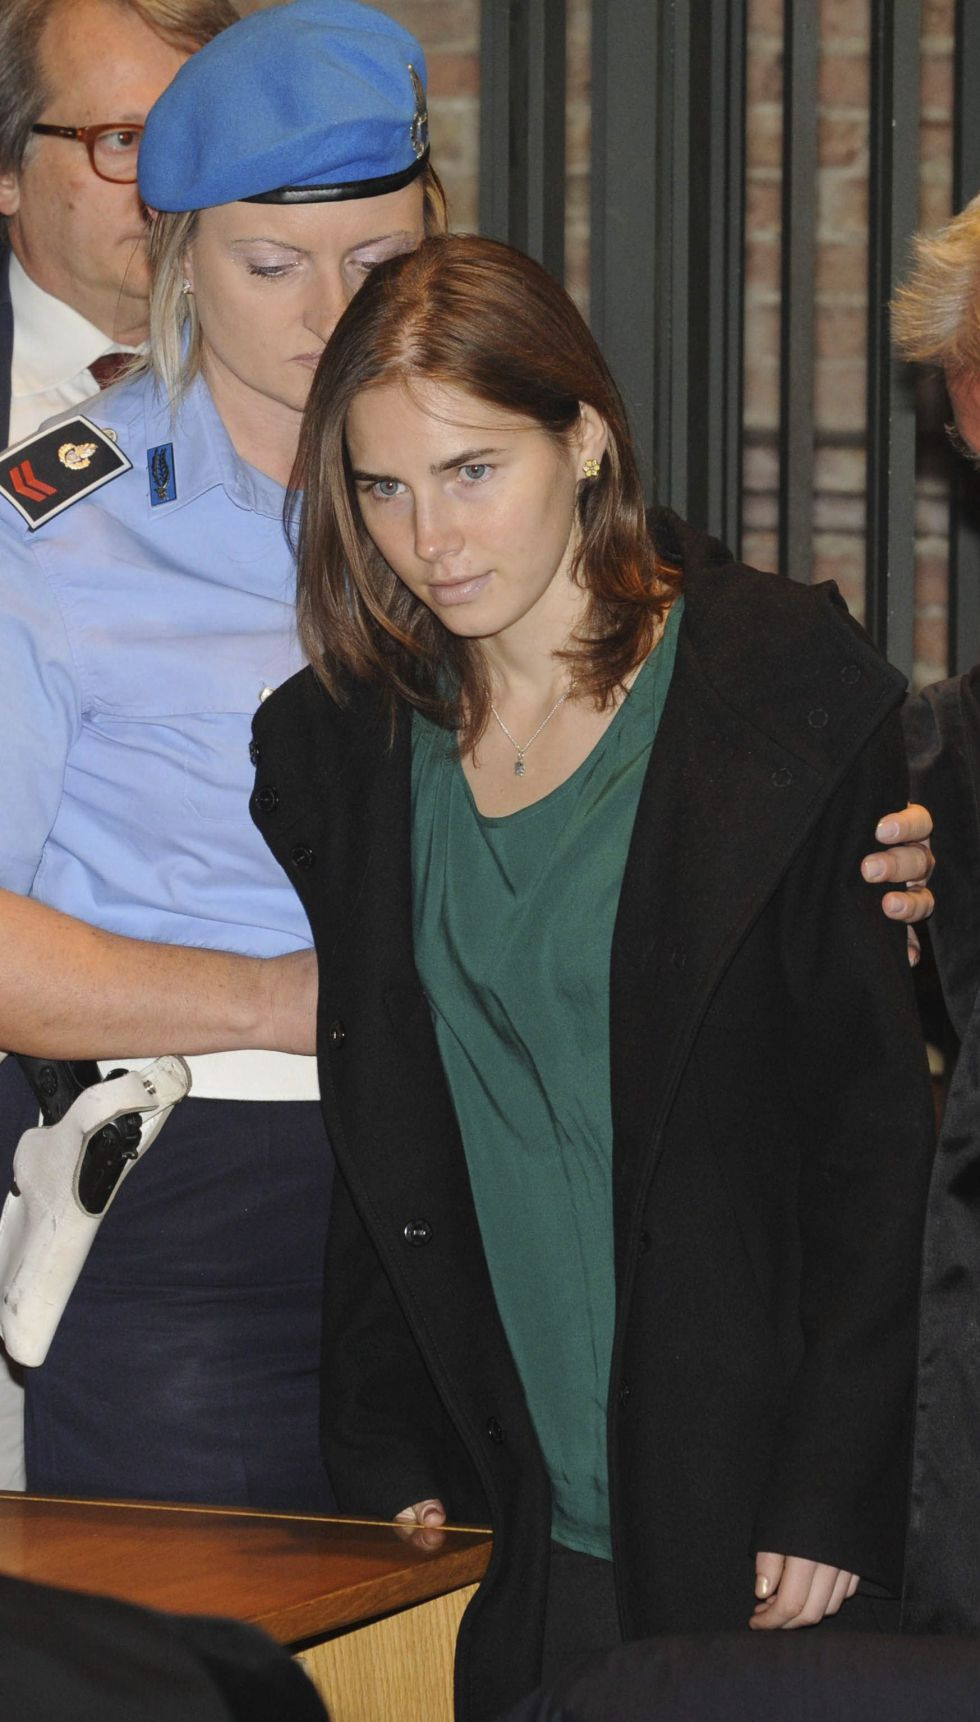 La estadounidense Amanda Knox llega escoltada al tribunal en Perugia.